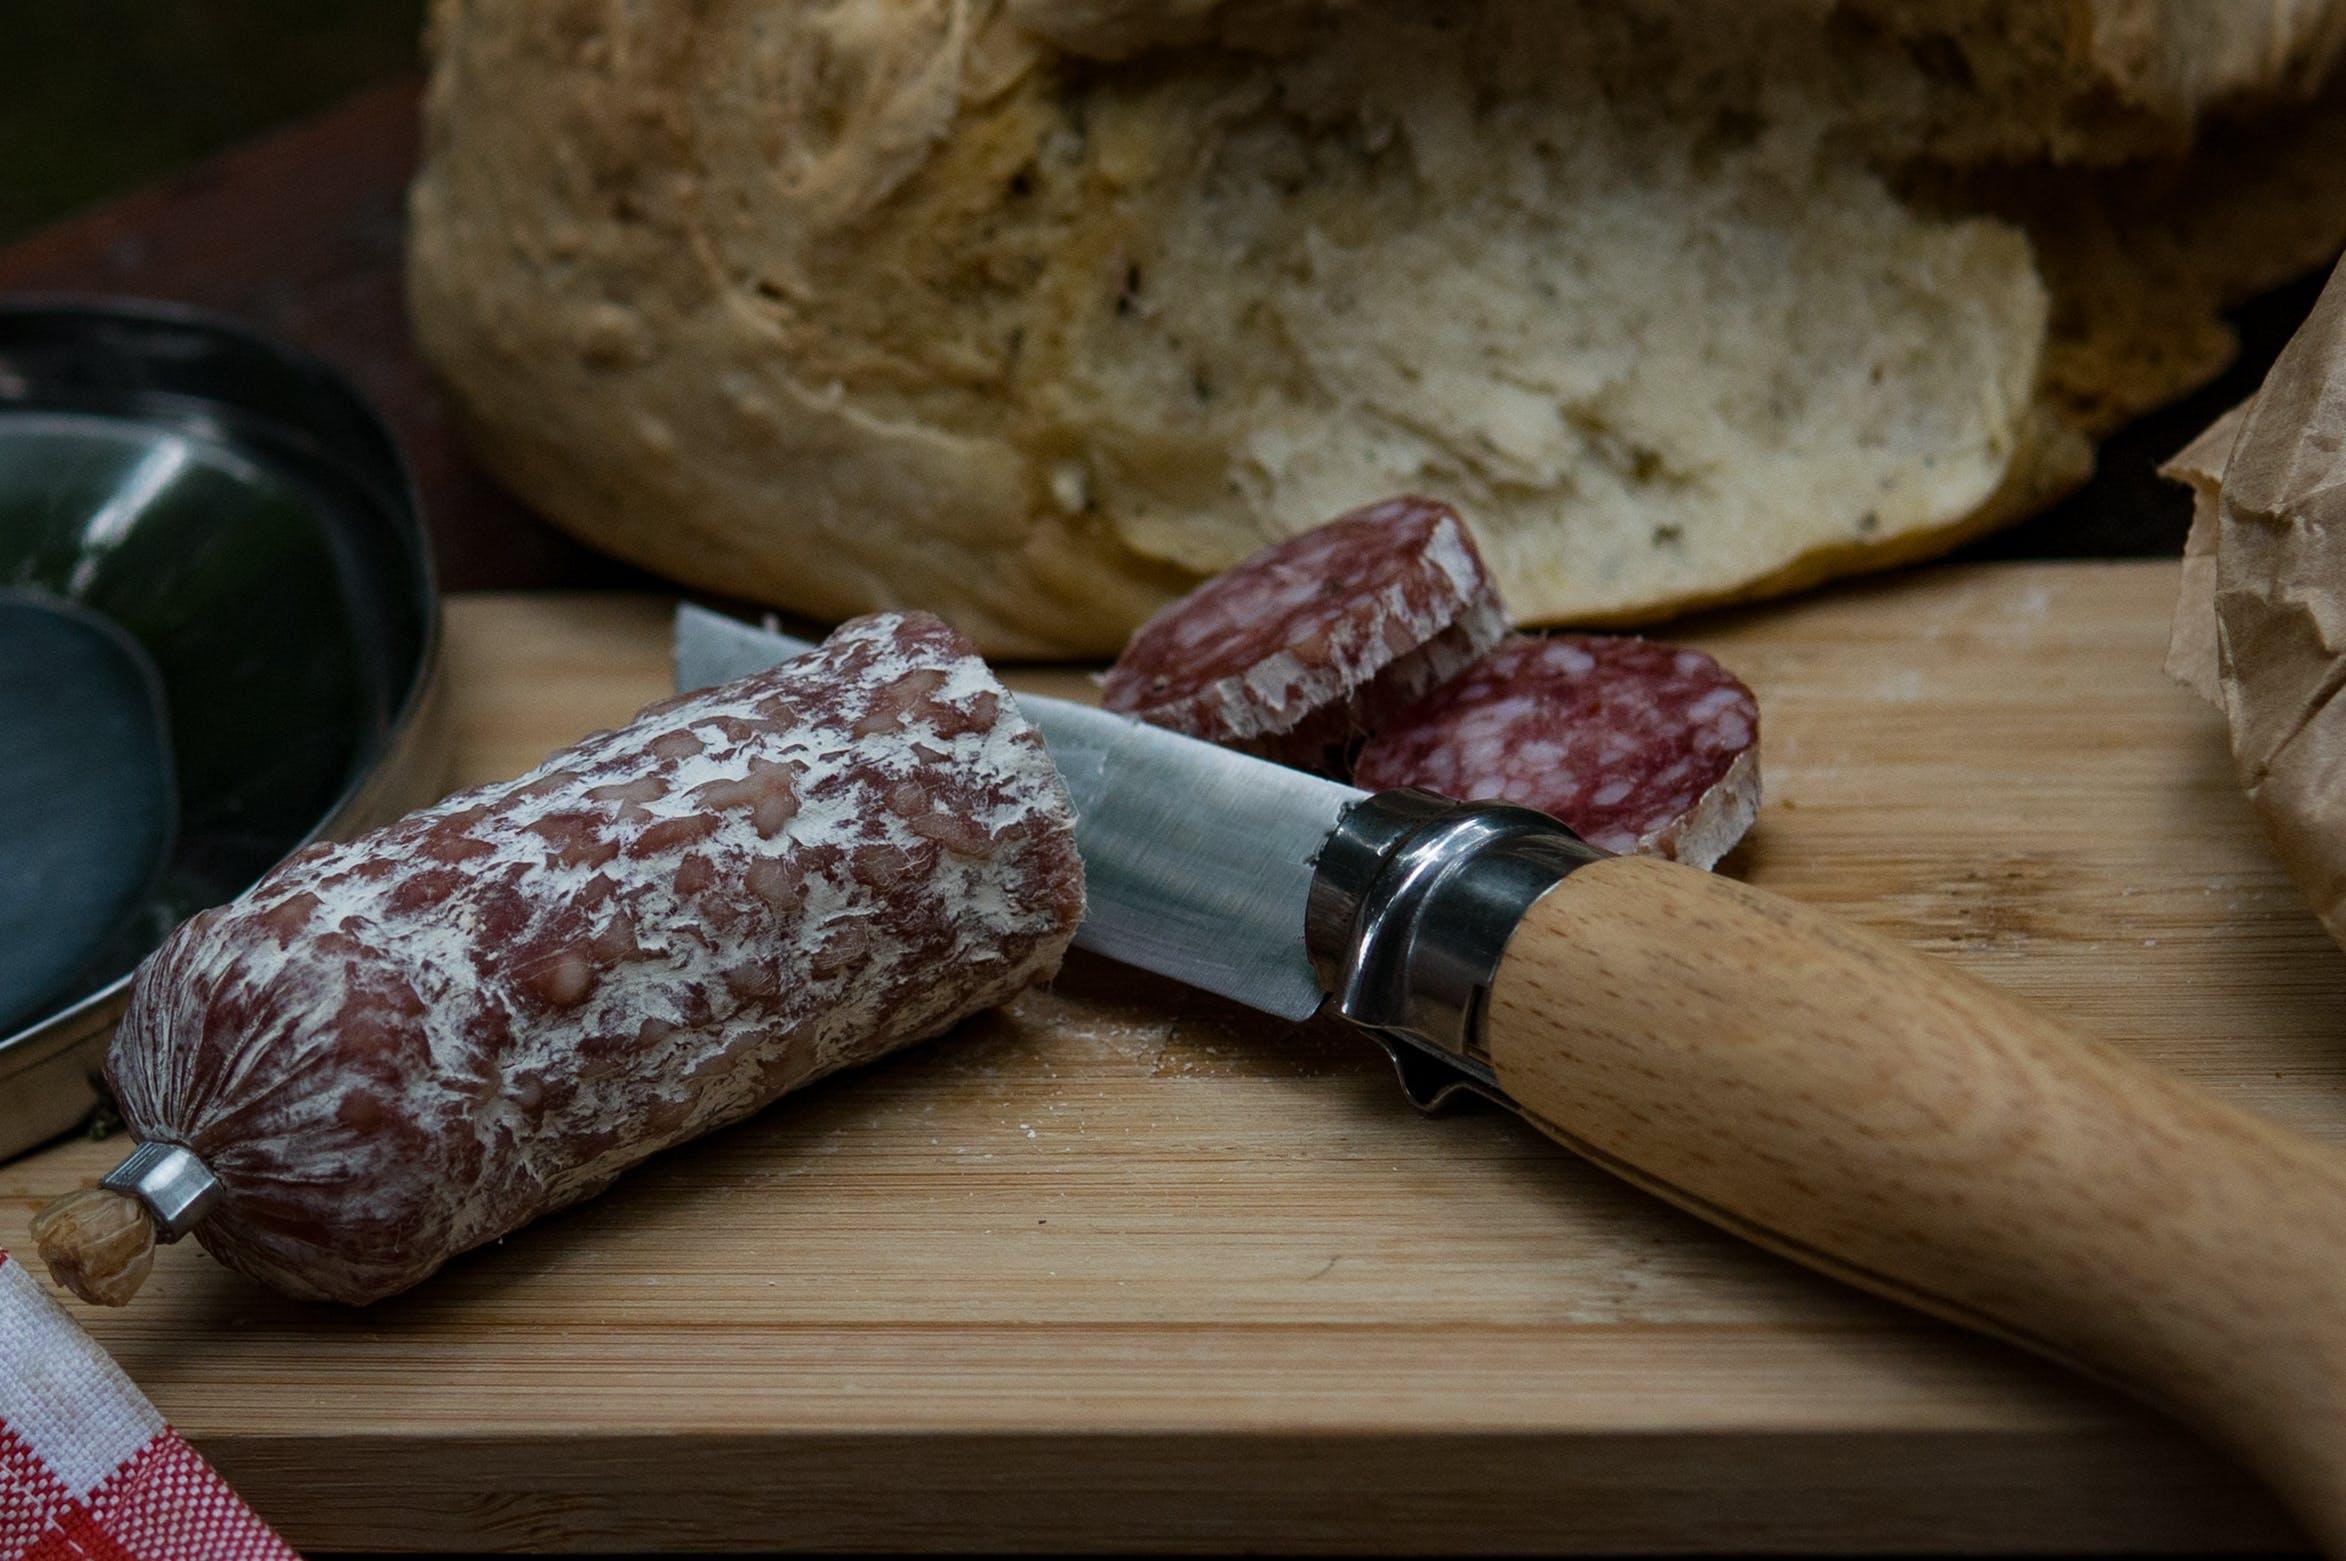 Salami and Knife